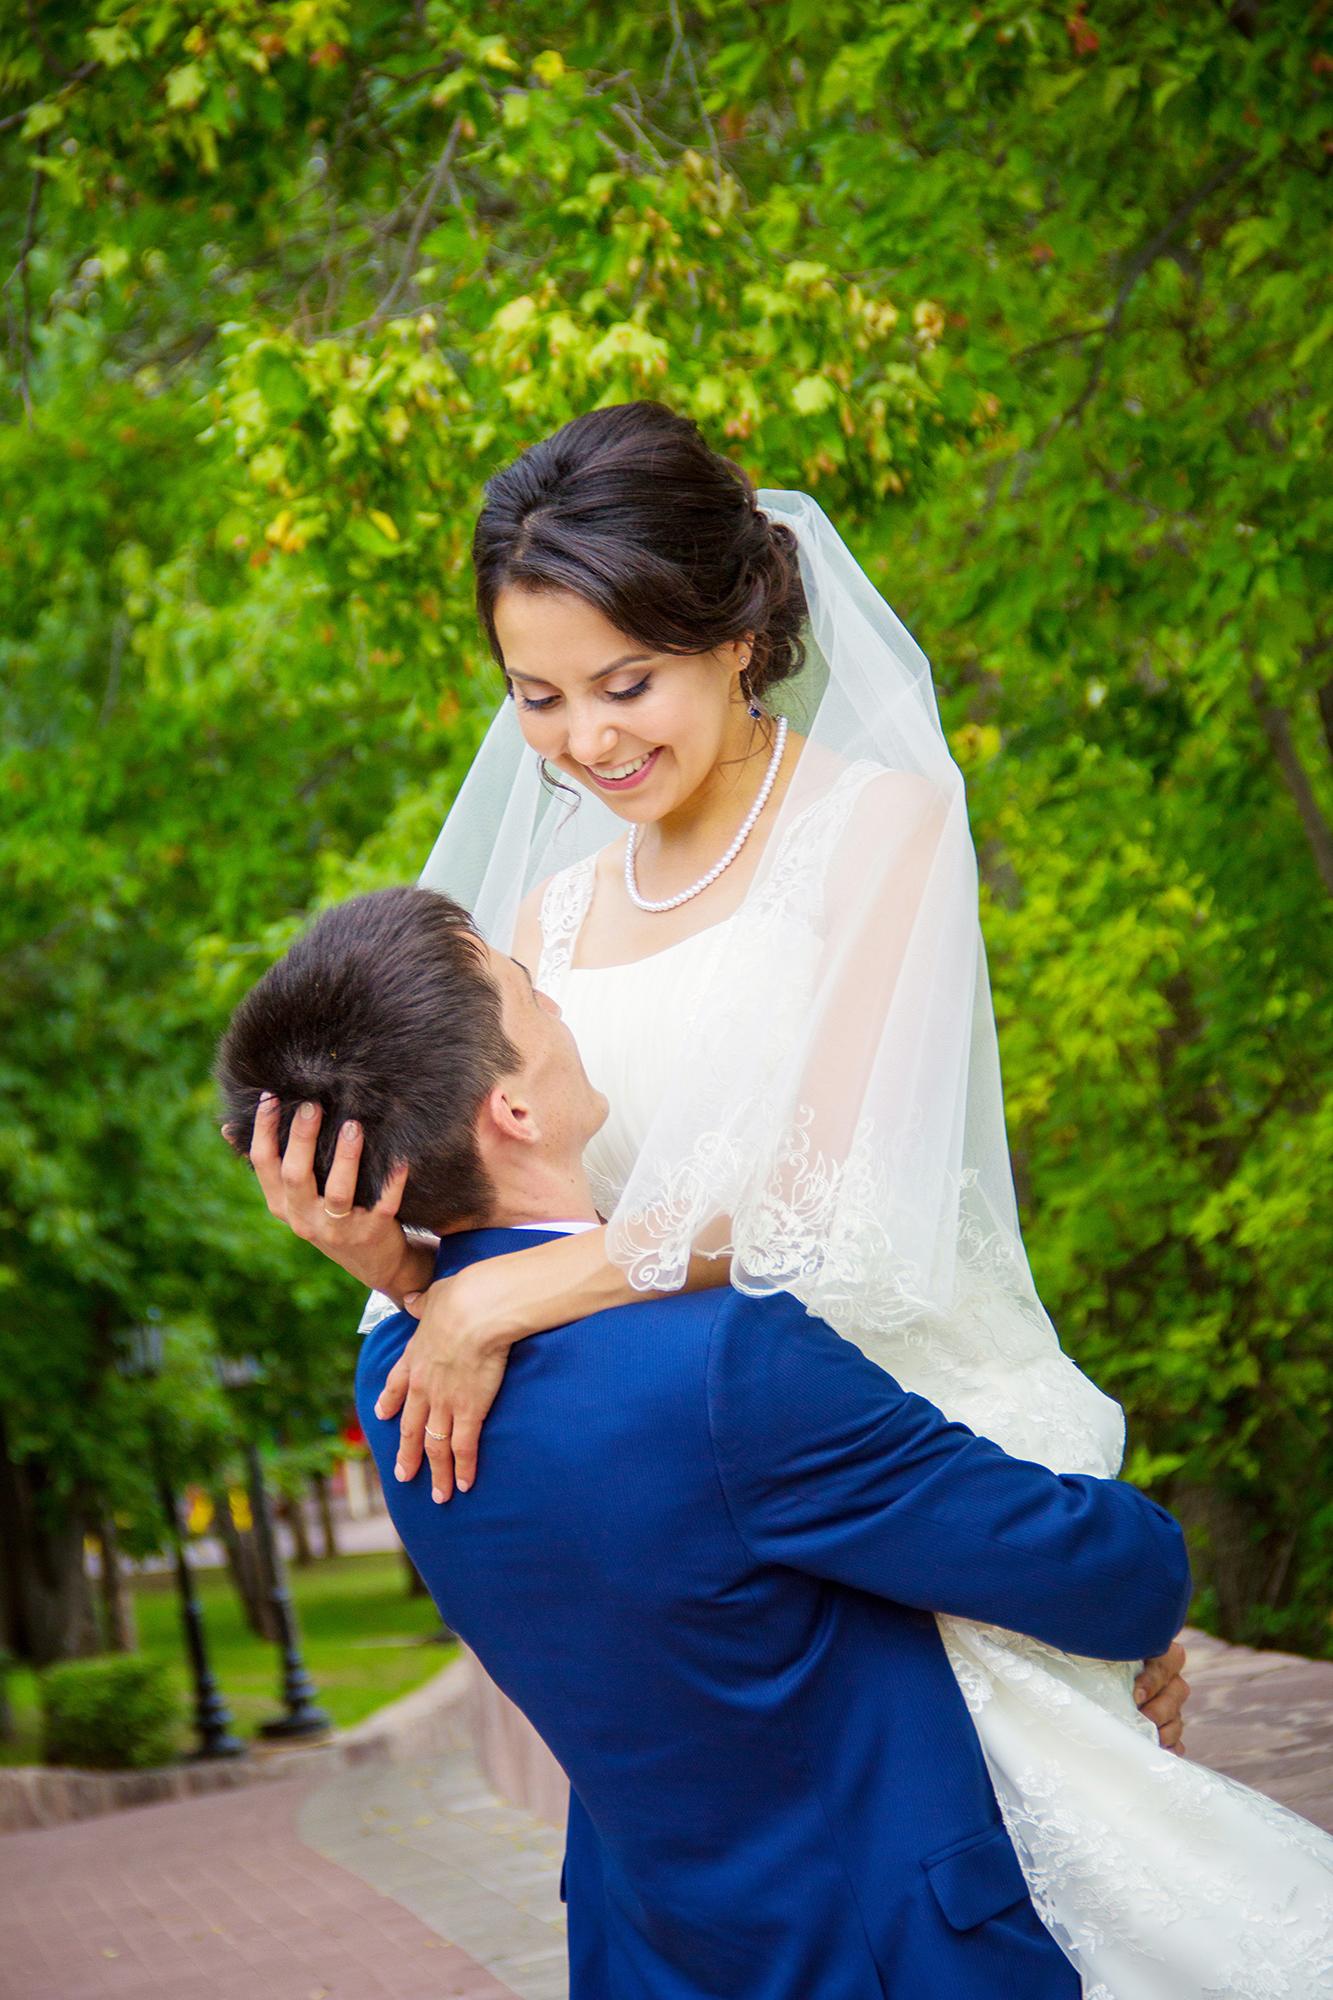 Свадьба Радмира и Лили